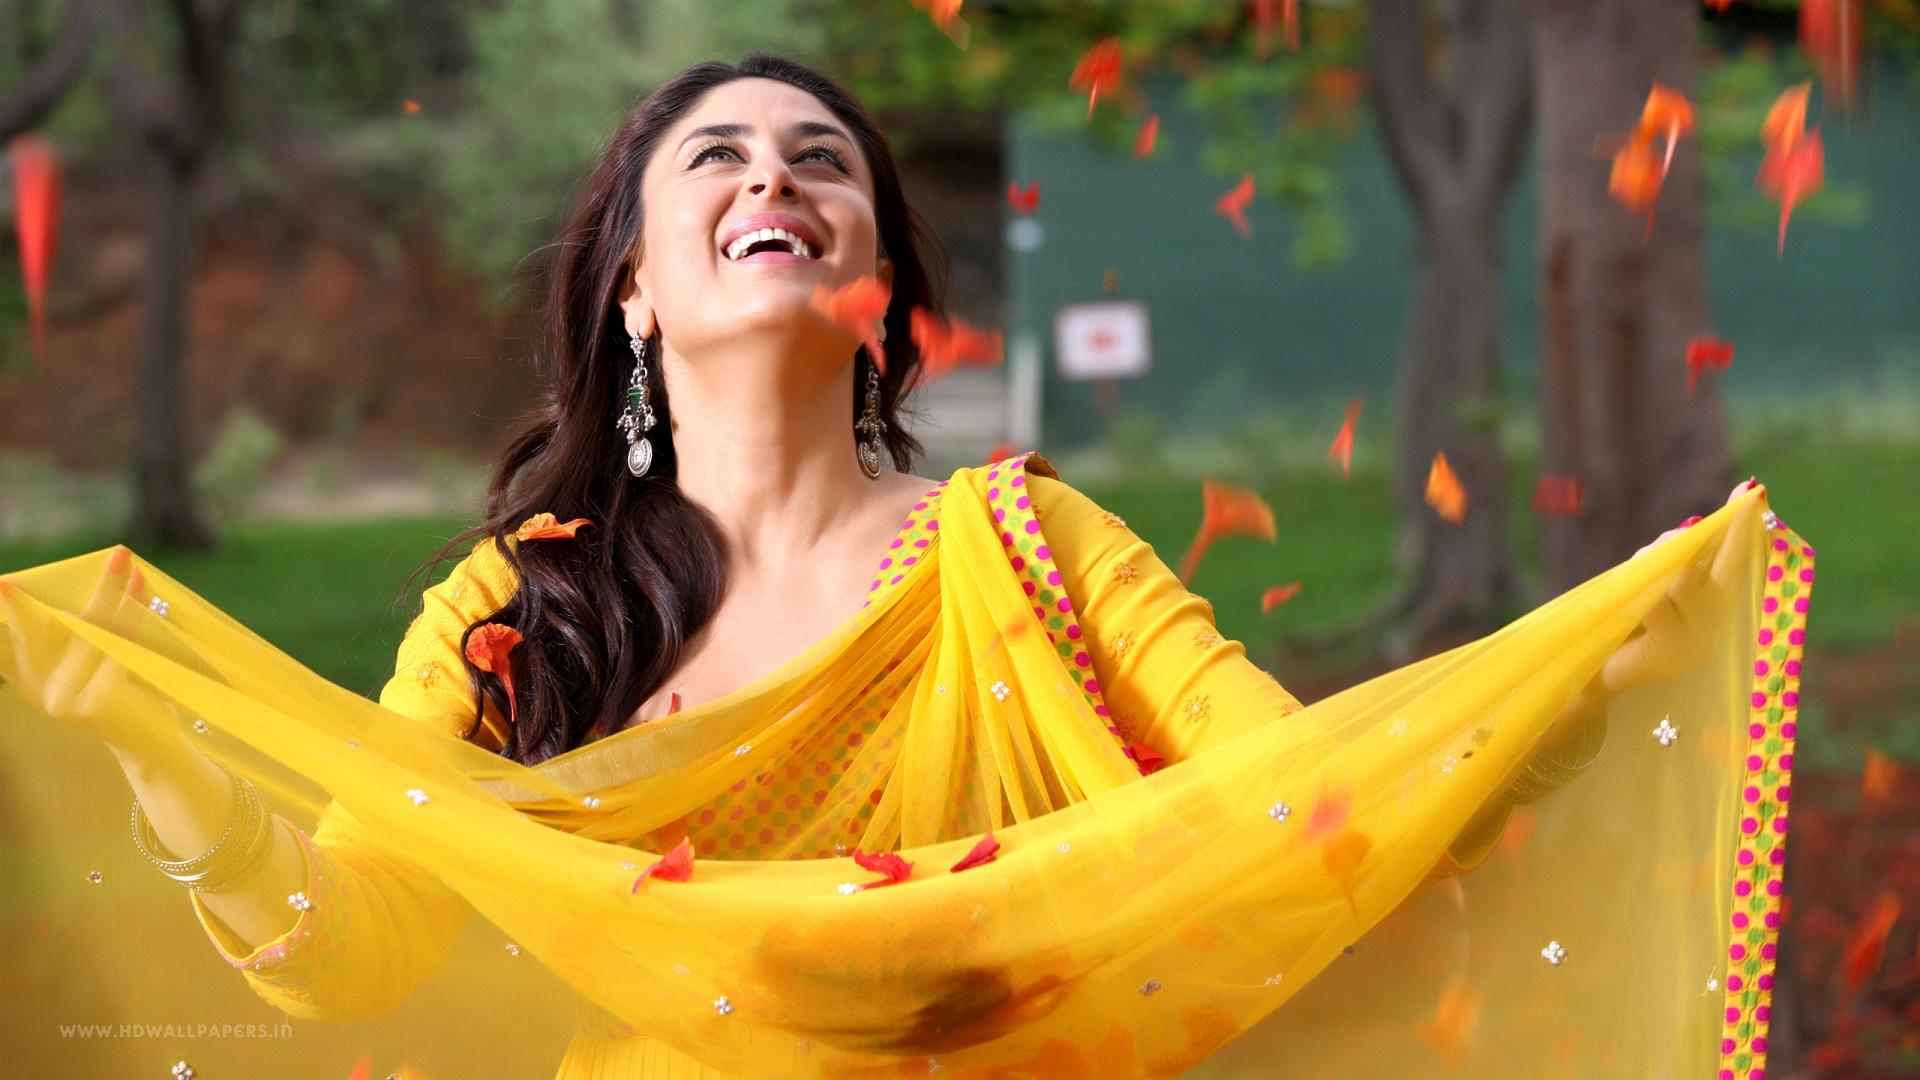 Trisha Hd Cute Wallpapers Kareena Kapoor Wallpapers